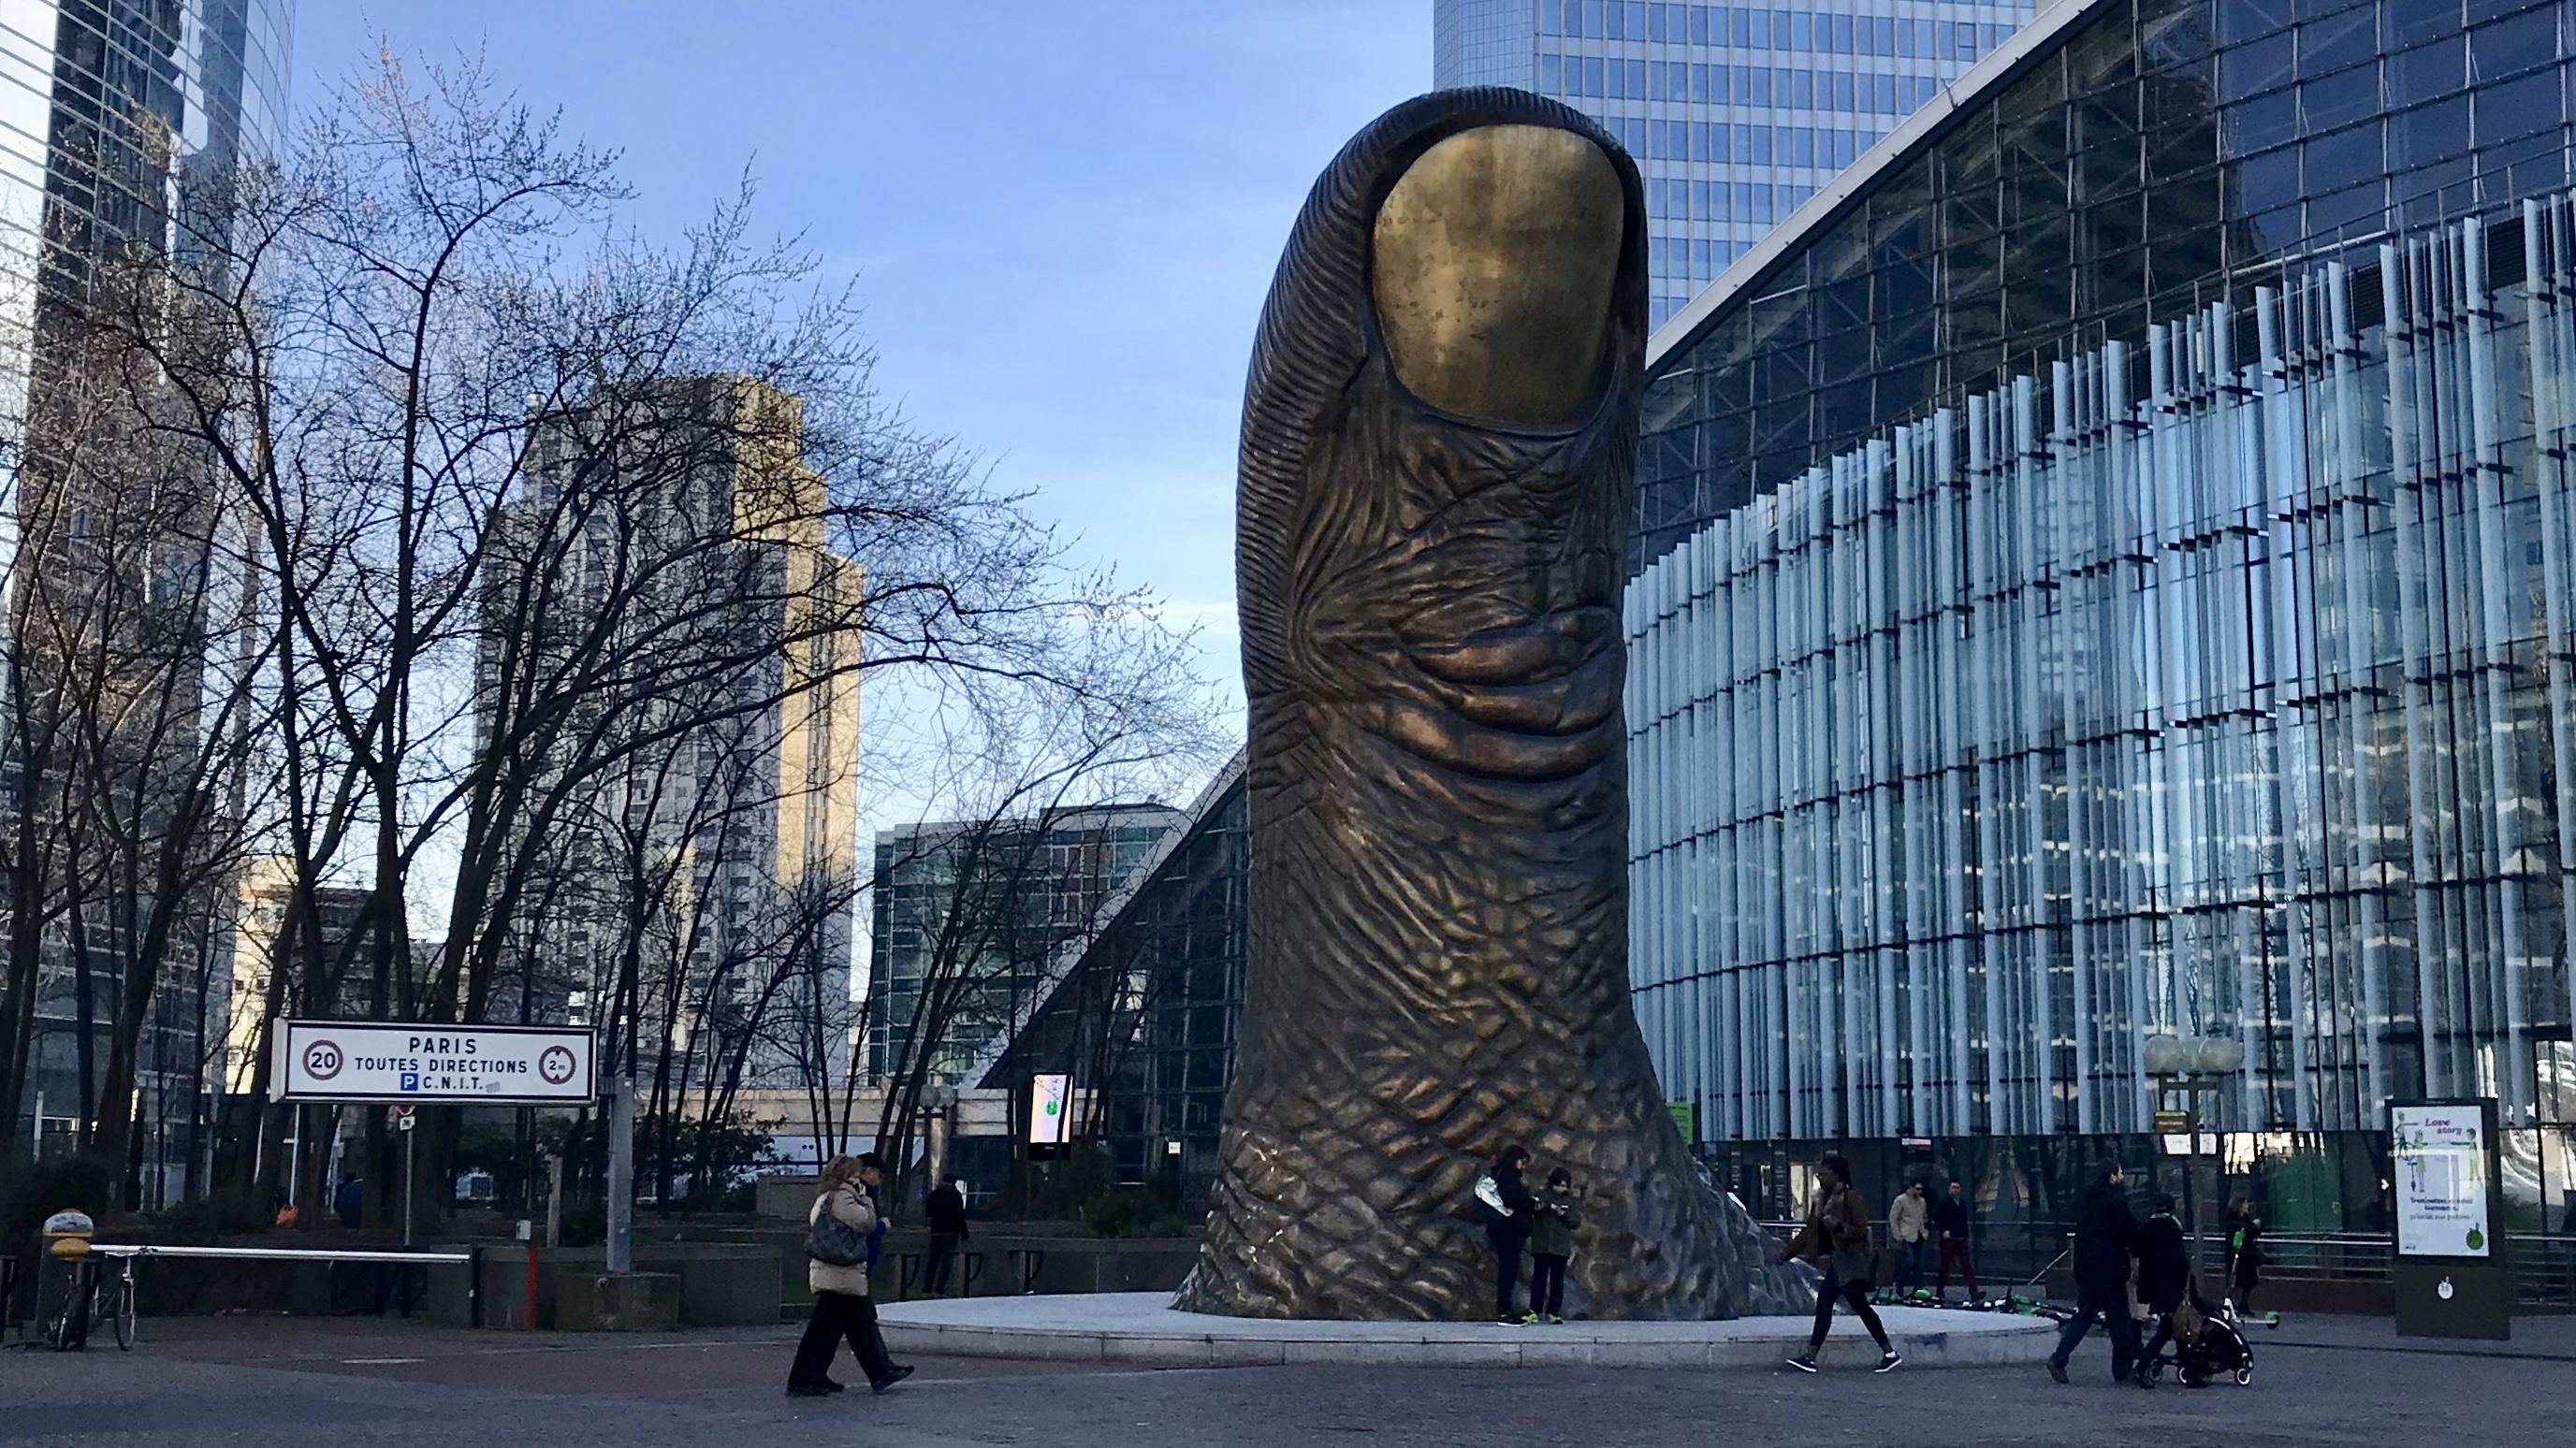 Thumbs Up in Paris